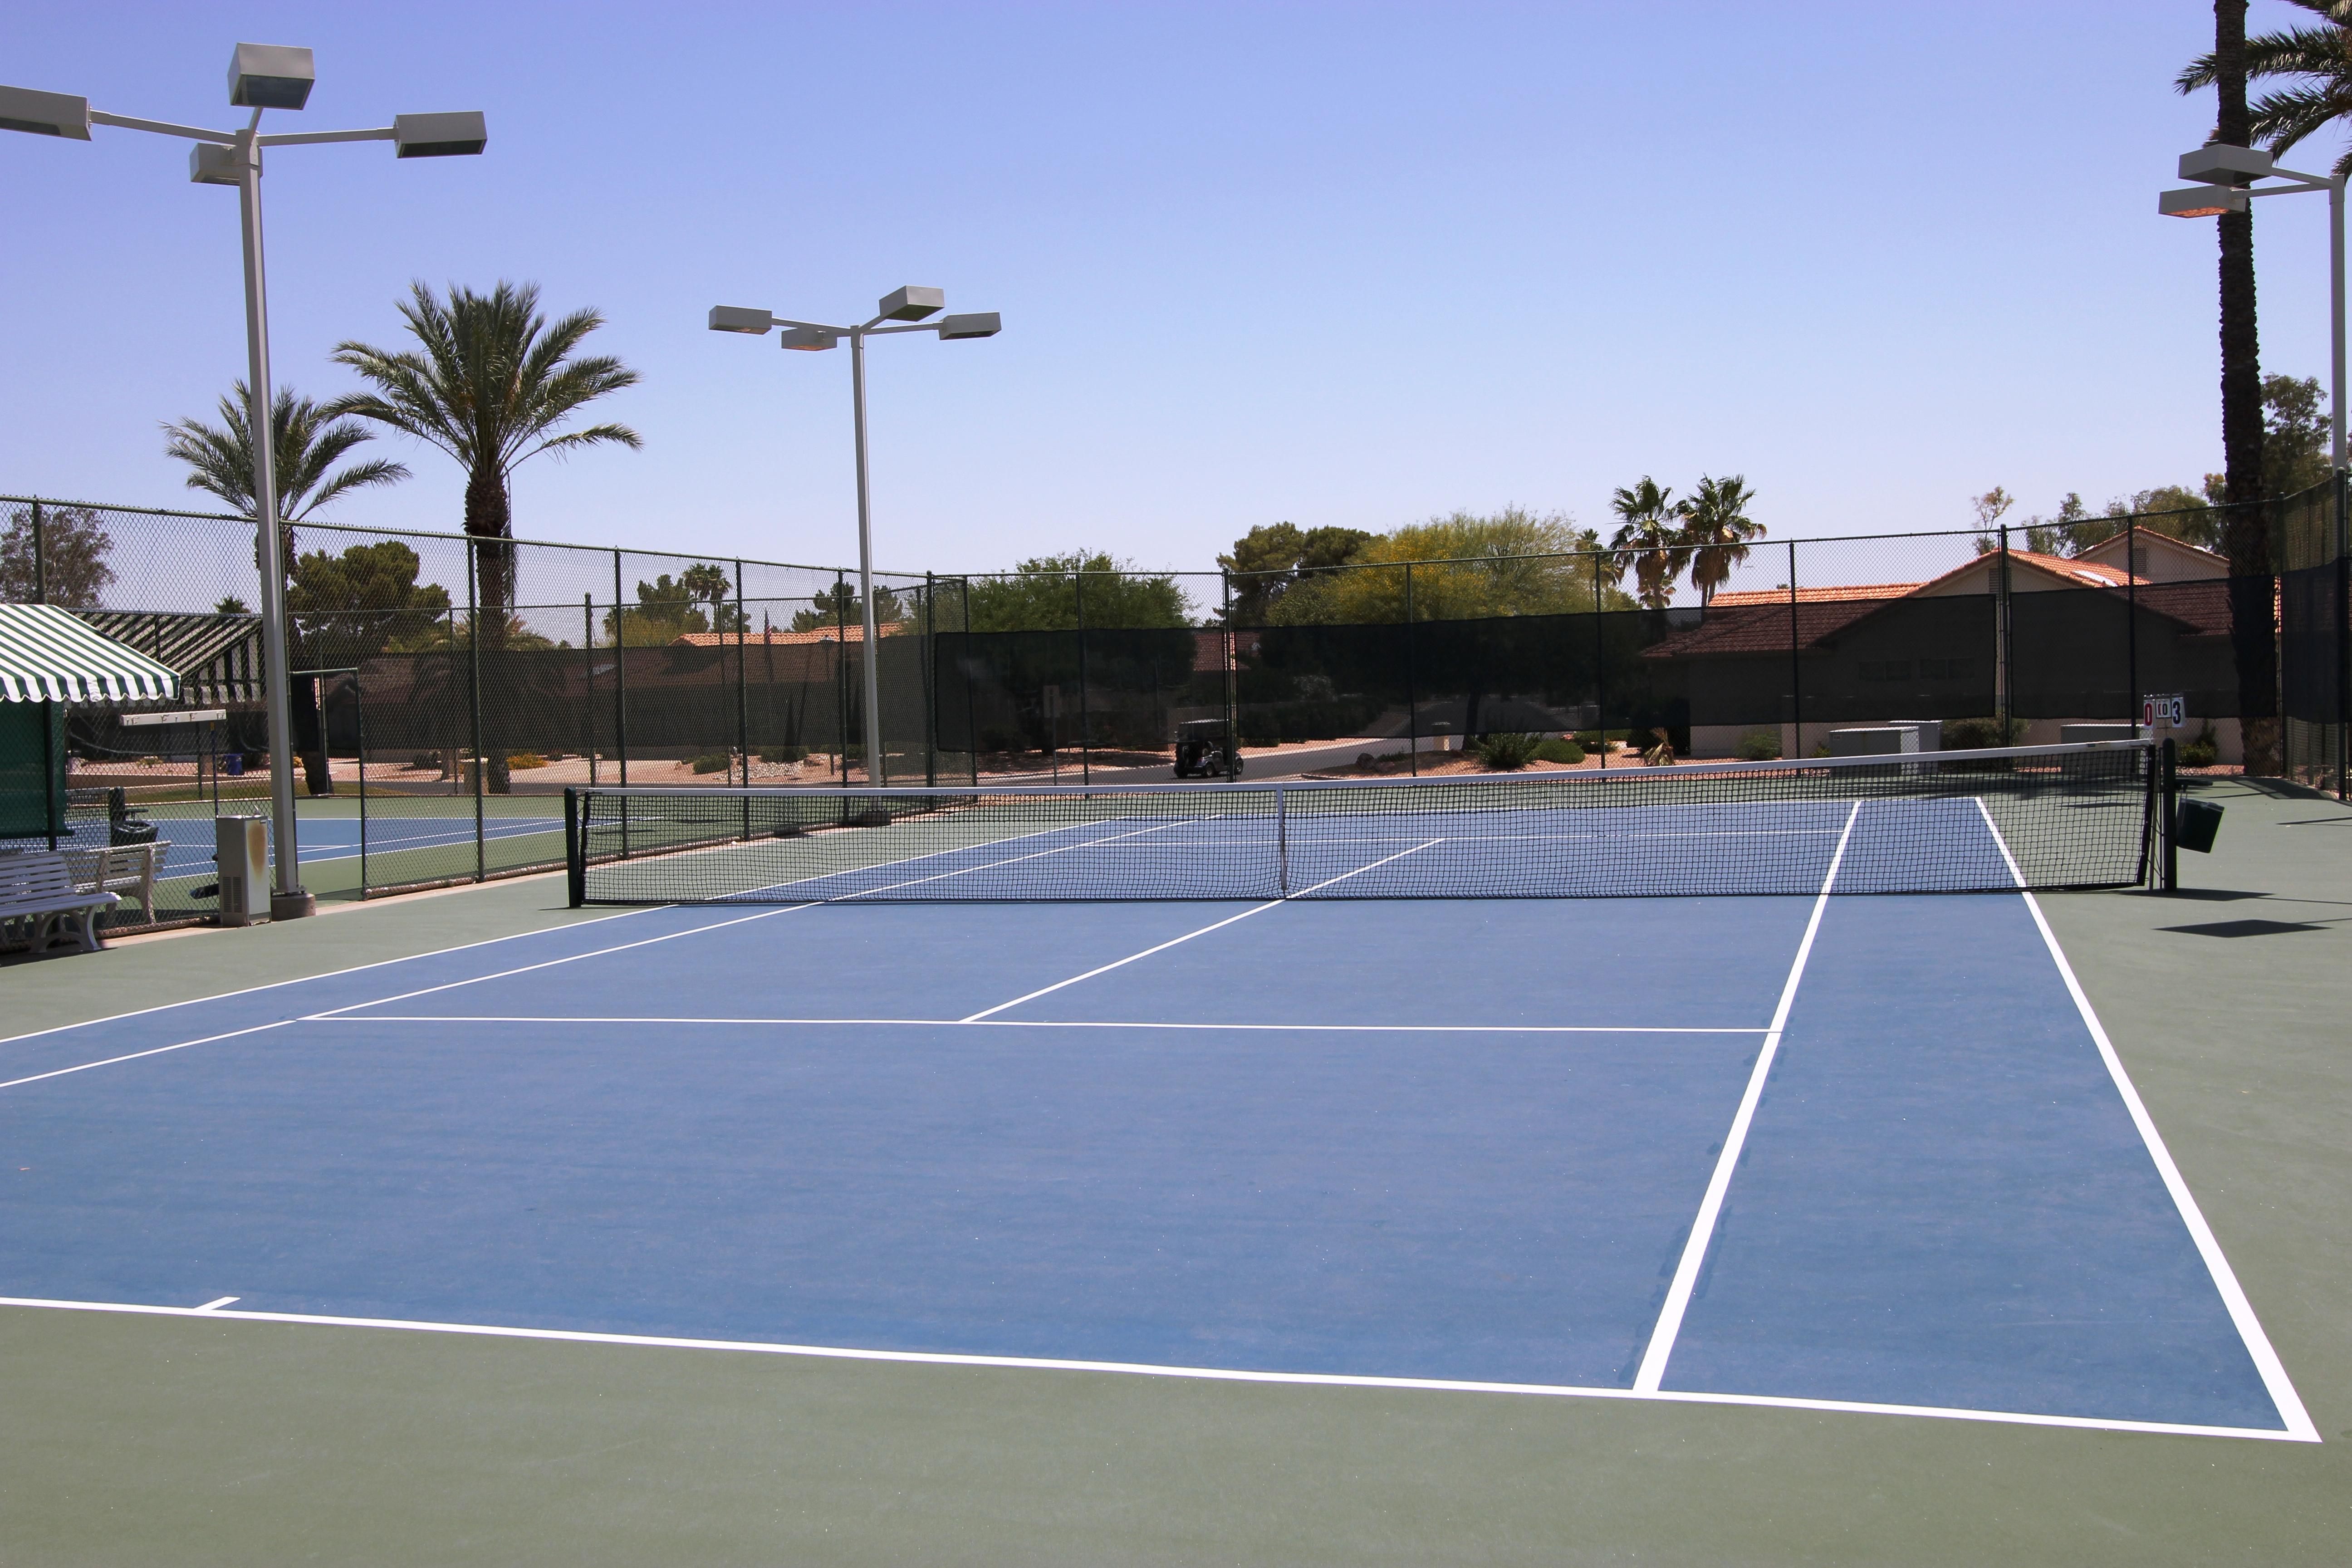 11 Tennis & Pickleball courts